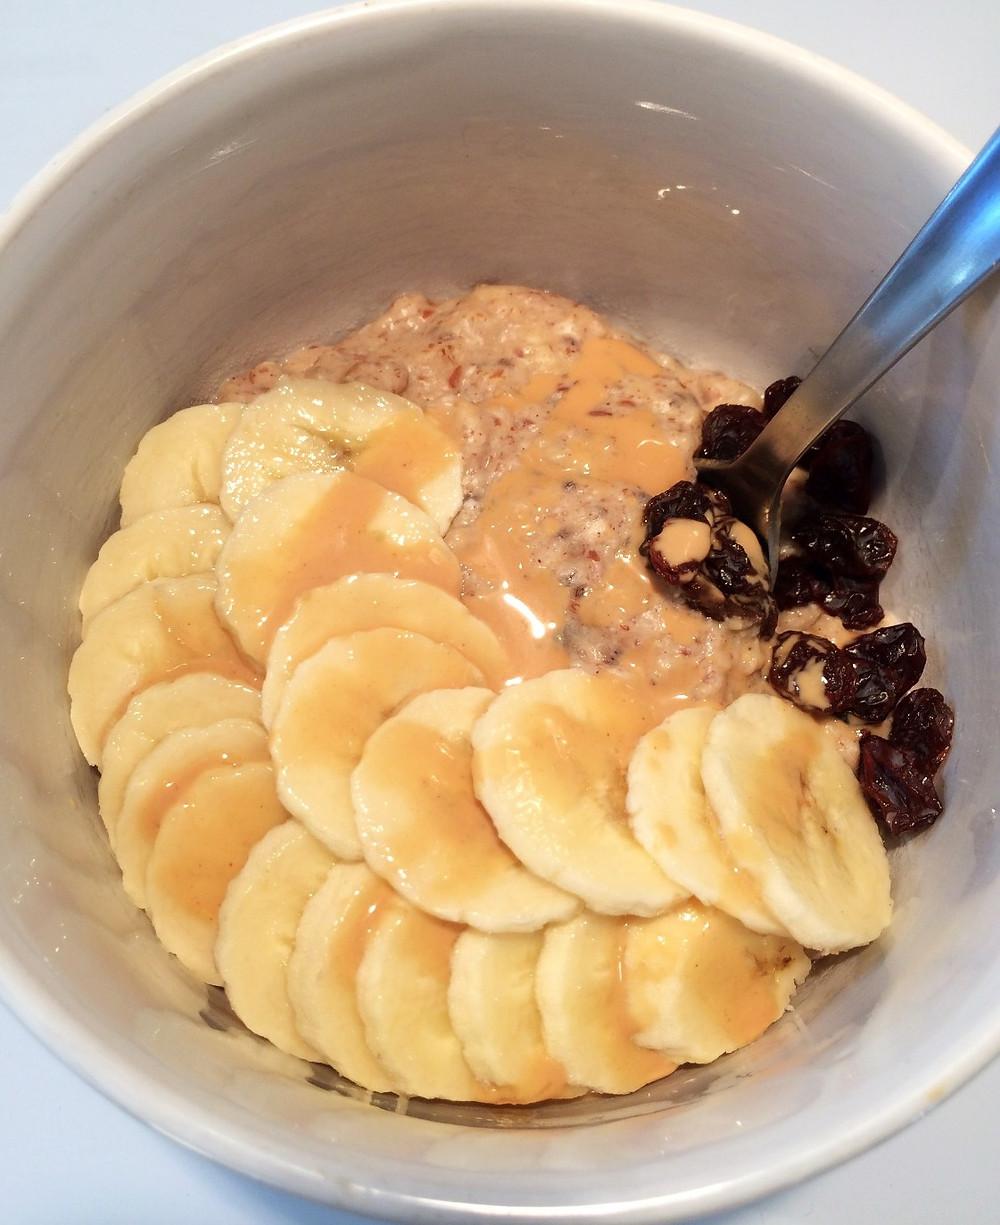 Peanut Butter & Banana Oatmeal